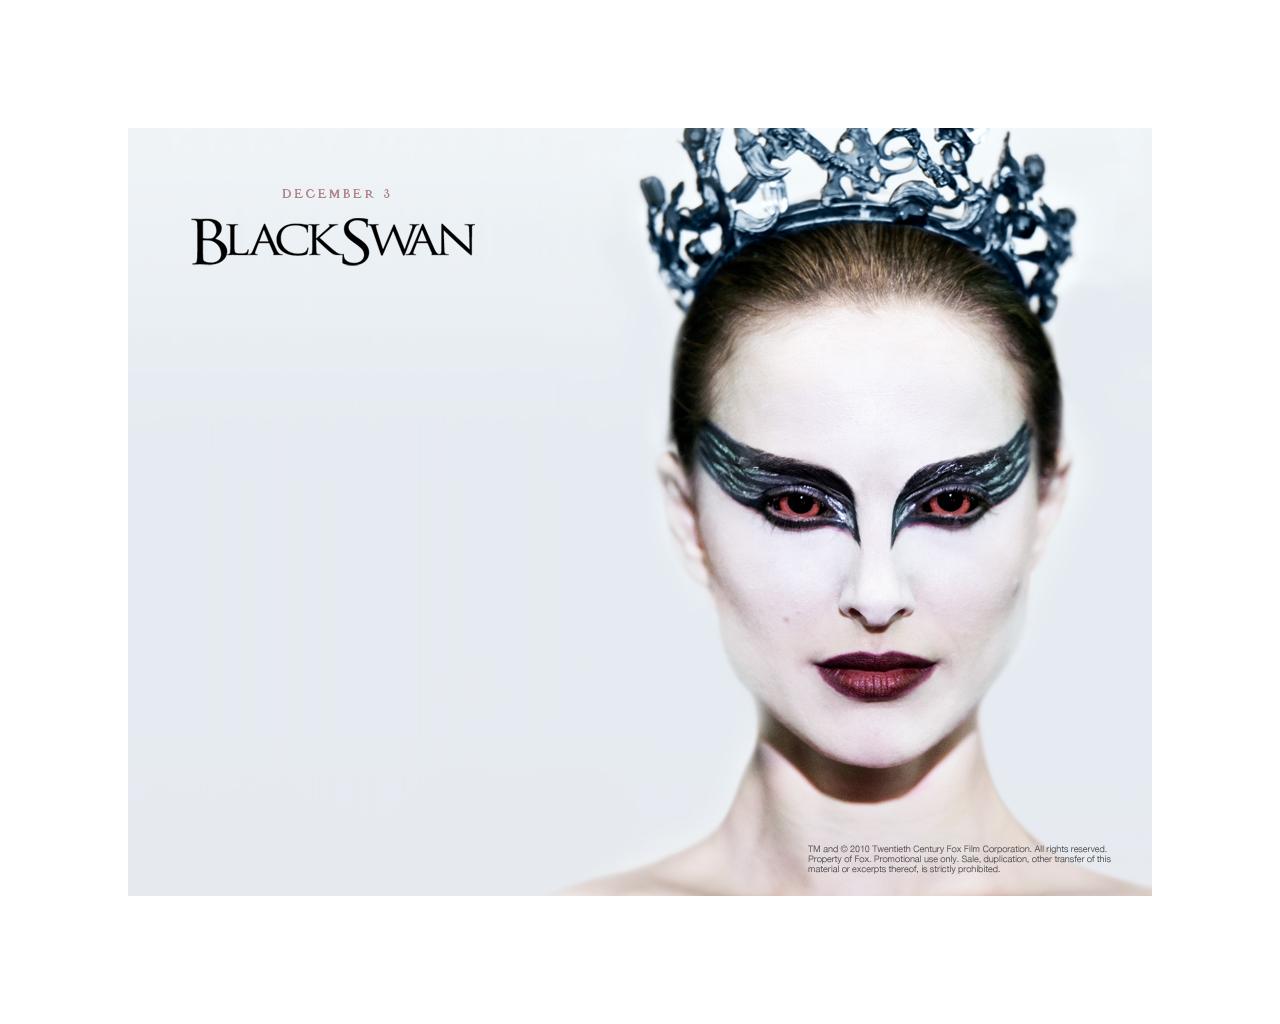 http://1.bp.blogspot.com/-XD6qtaxMtnk/TWvZ1hkpNXI/AAAAAAAAAKg/FFkYQ4dDx9Y/s1600/Natalie_Portman_in_Black_Swan_Wallpaper_1_800.jpg